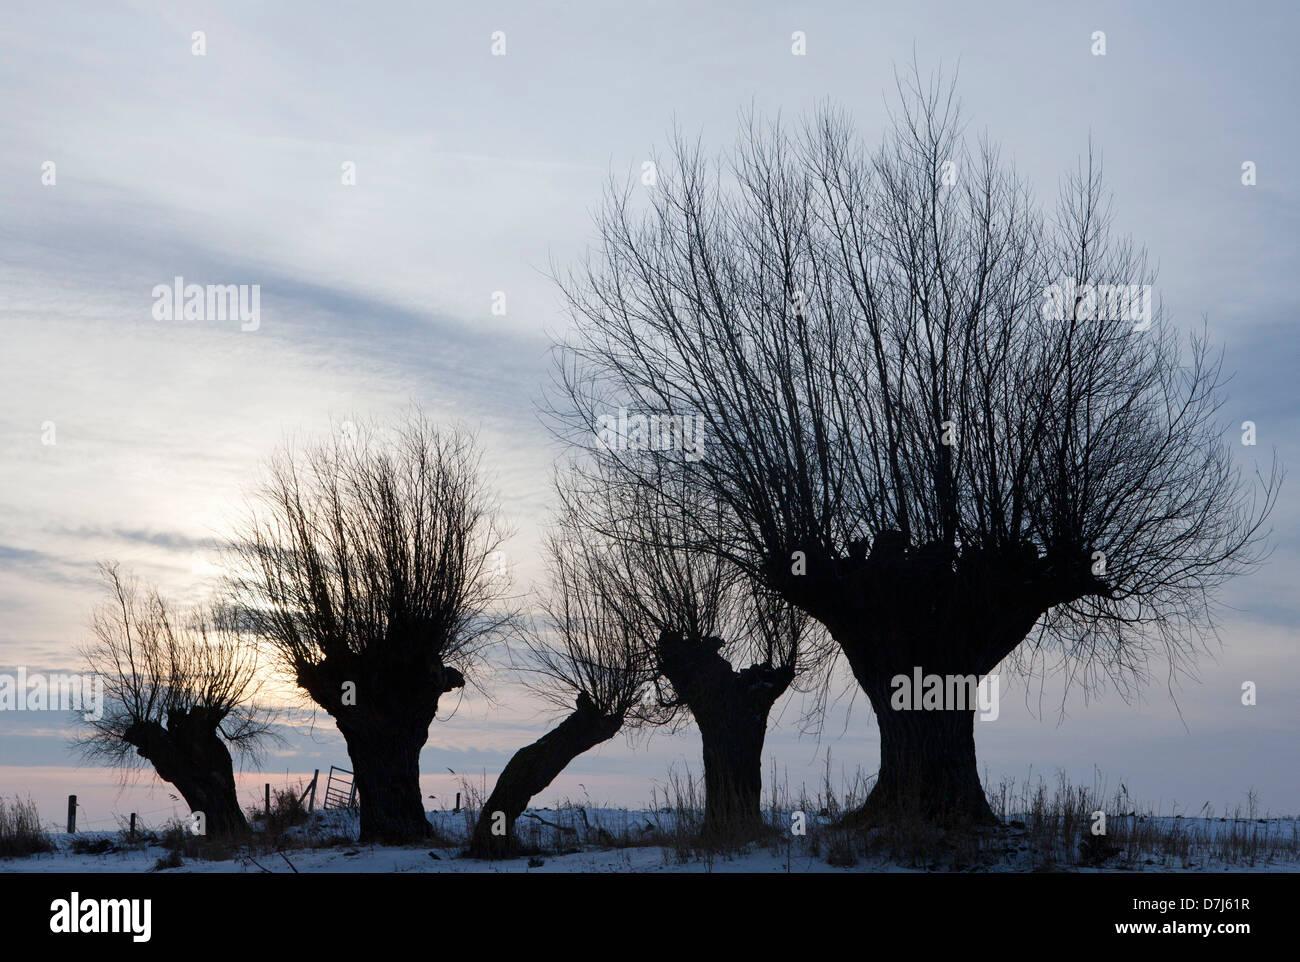 willows in national park 'de biesbosch' in Holland - Stock Image